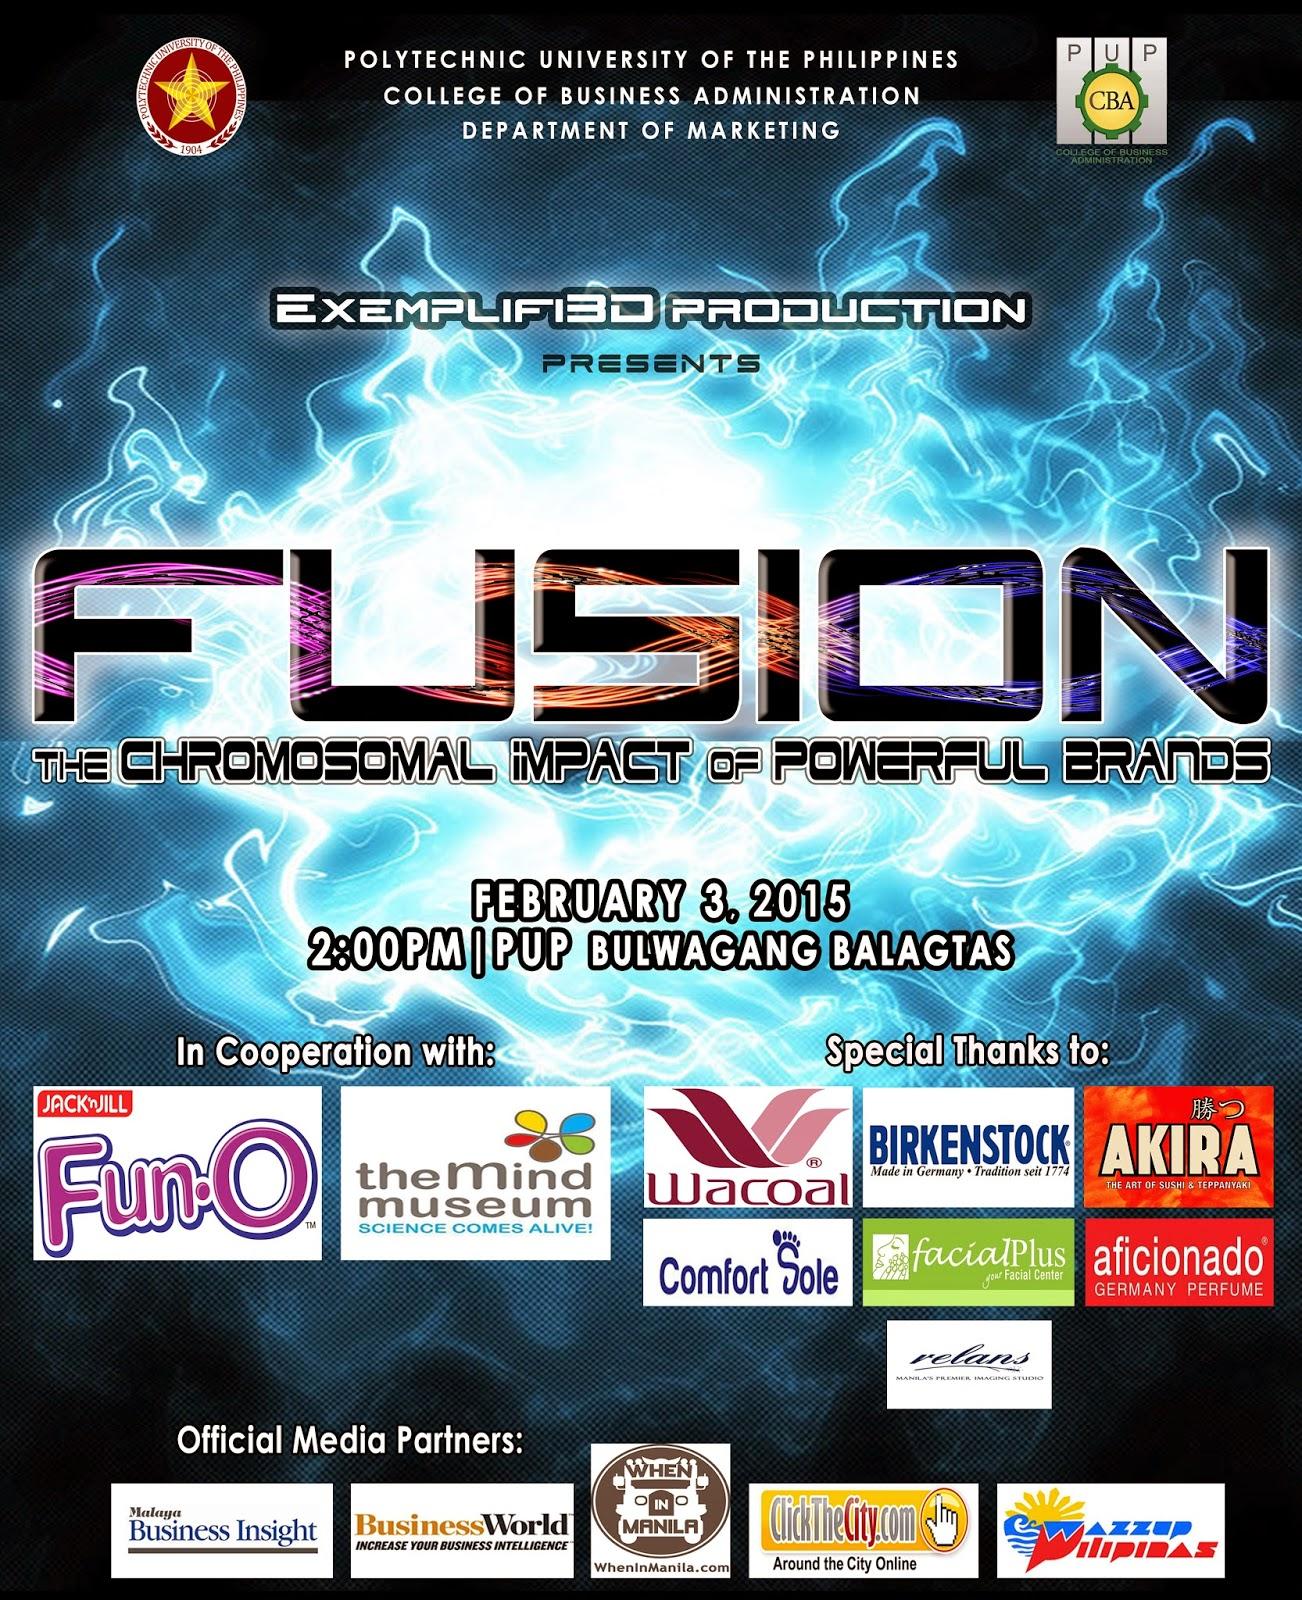 d21b26d3245b Fusion  The Chromosomal Impact of Powerful Brands